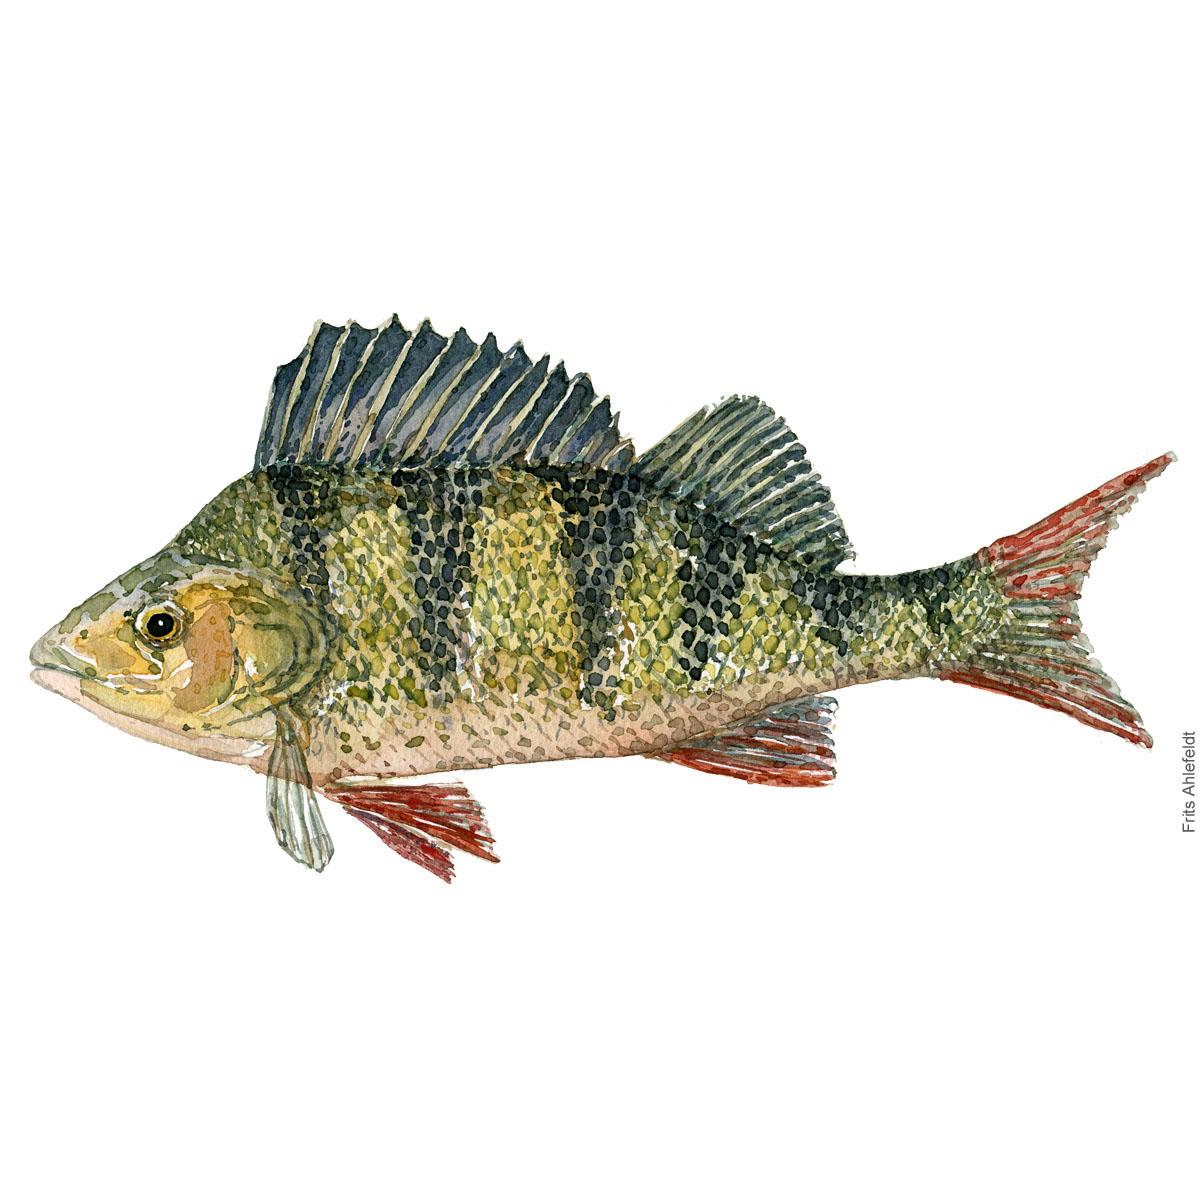 Aborre - fish watercolor illustration. Painting by Frits Ahlefeldt. Fiske akvarel